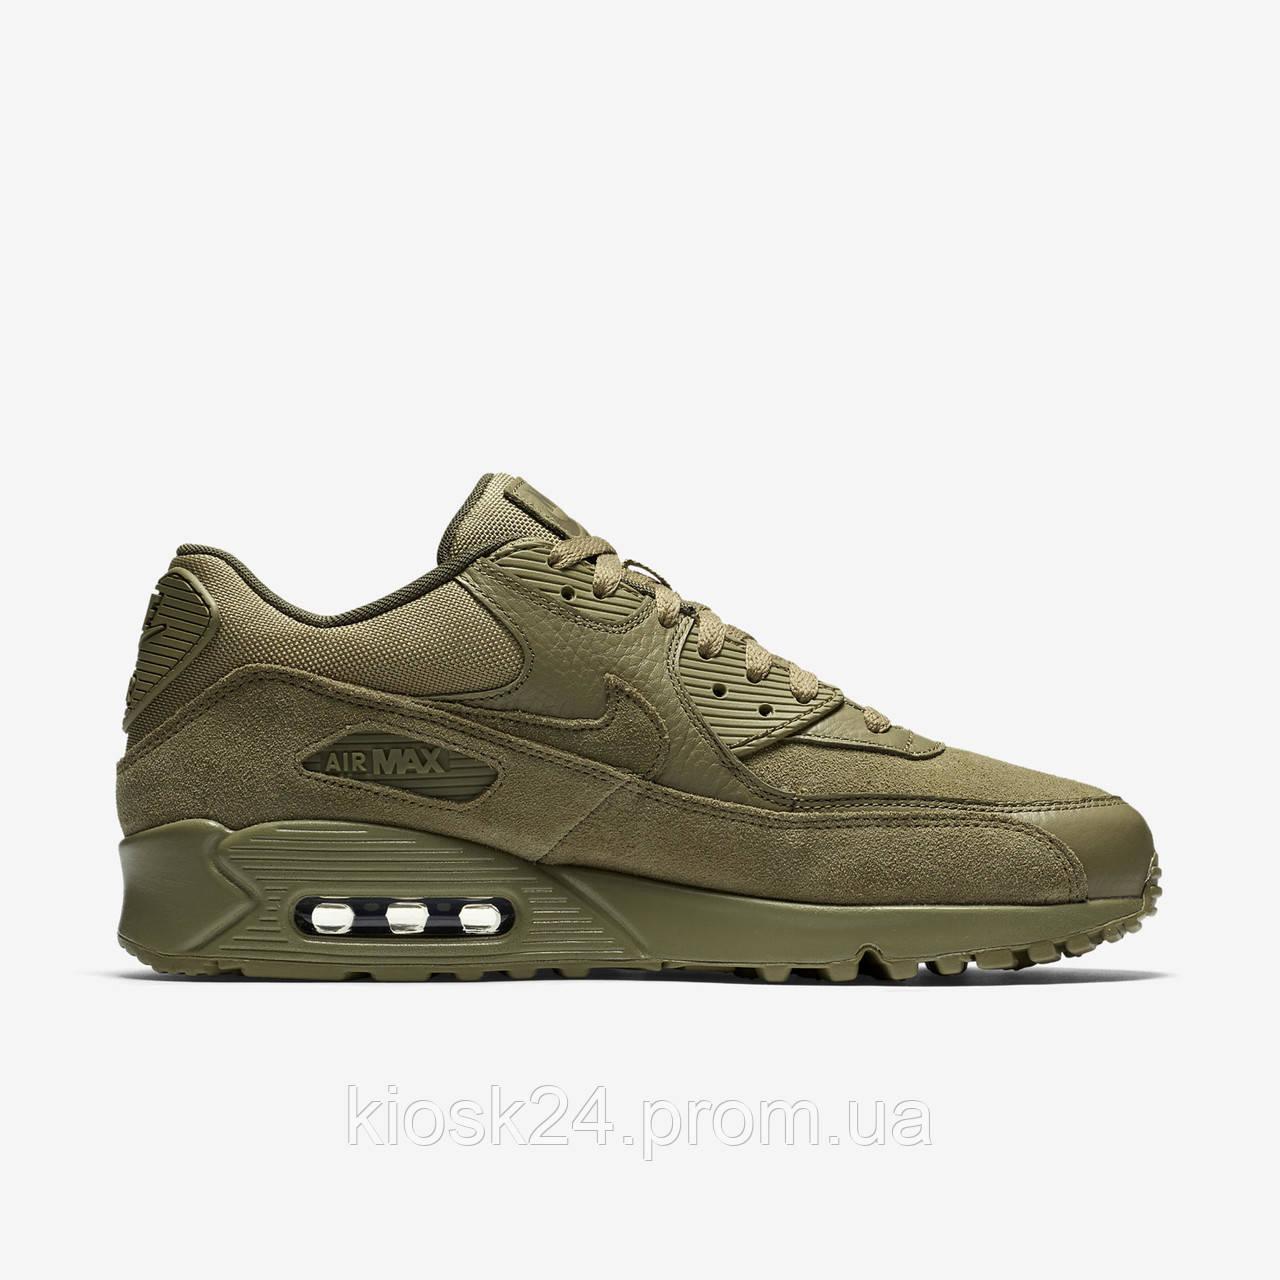 81f522622 Оригинальные кроссовки Nike Air Max 90 Premium Neutral Olive (700155 202) -  Sneakersbox -